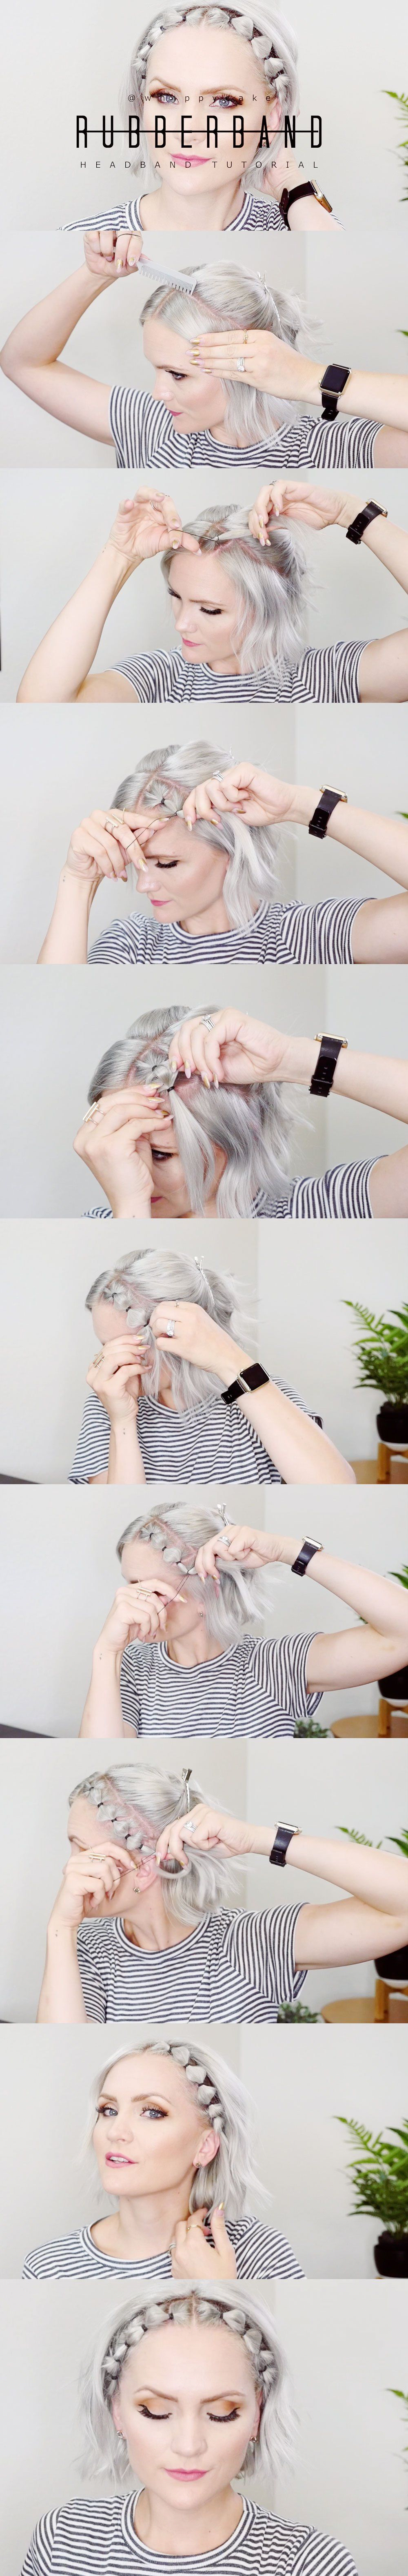 rubber band hair tutorial | hairstyles | short hair styles